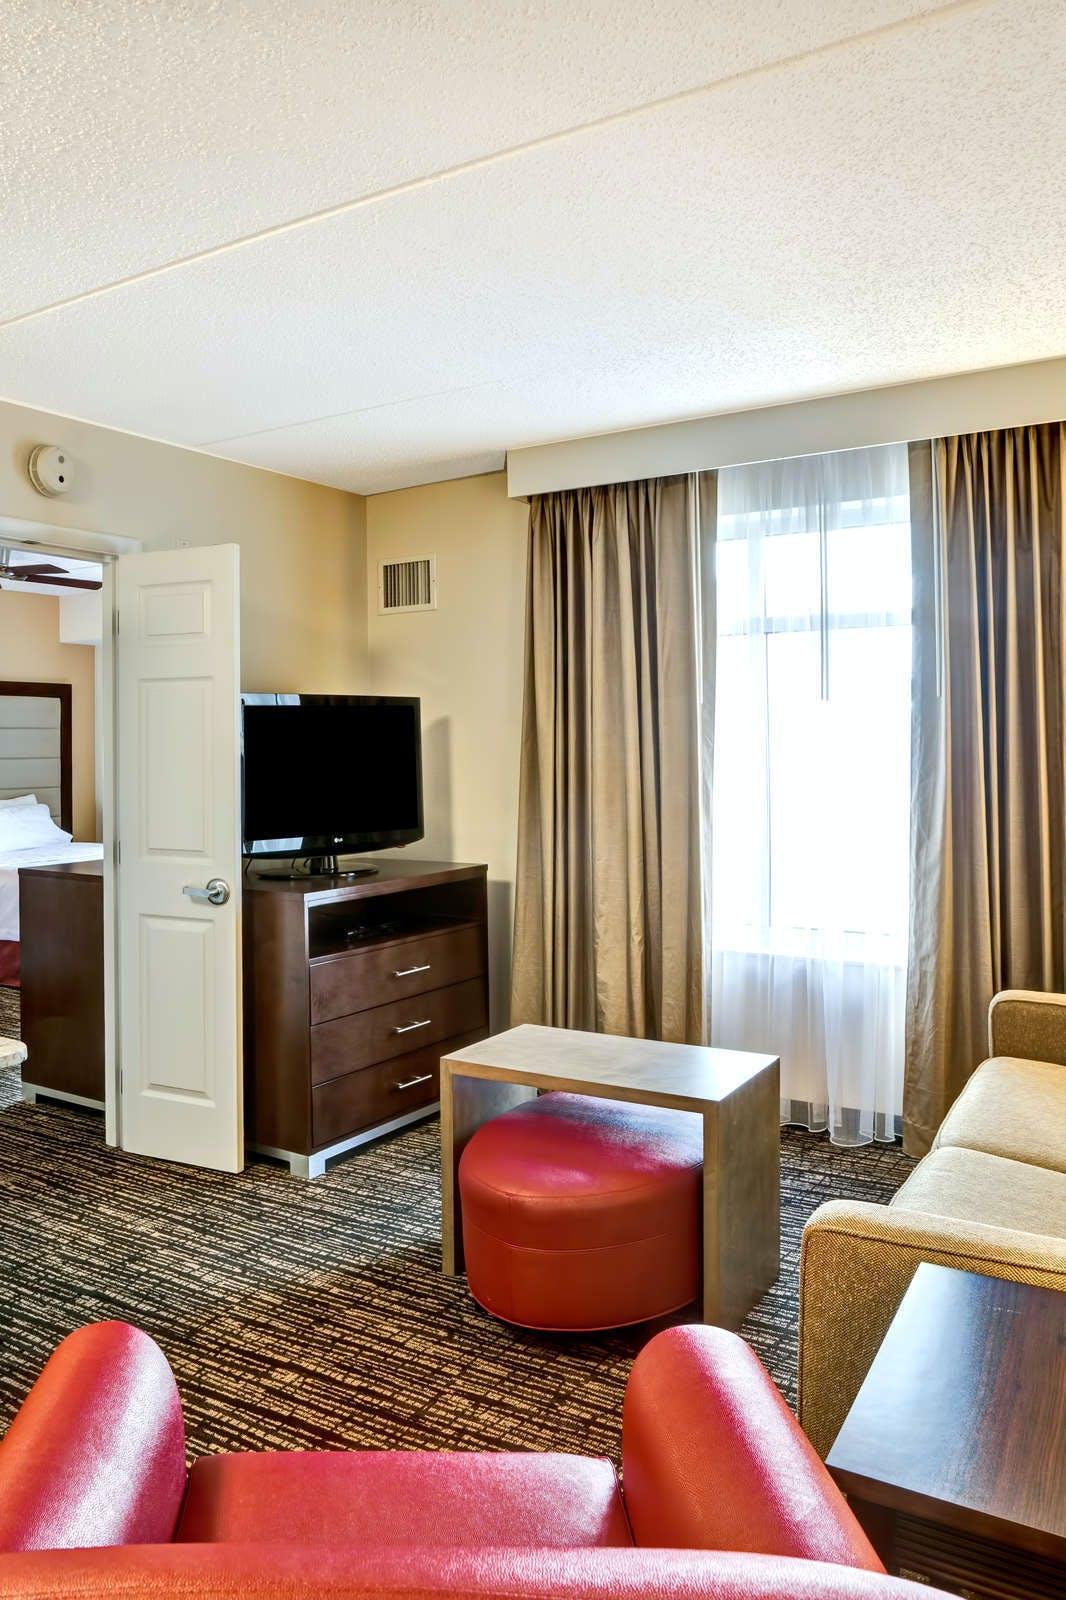 Homewood Suites by Hilton Washington DC Downtown Thomas Circle